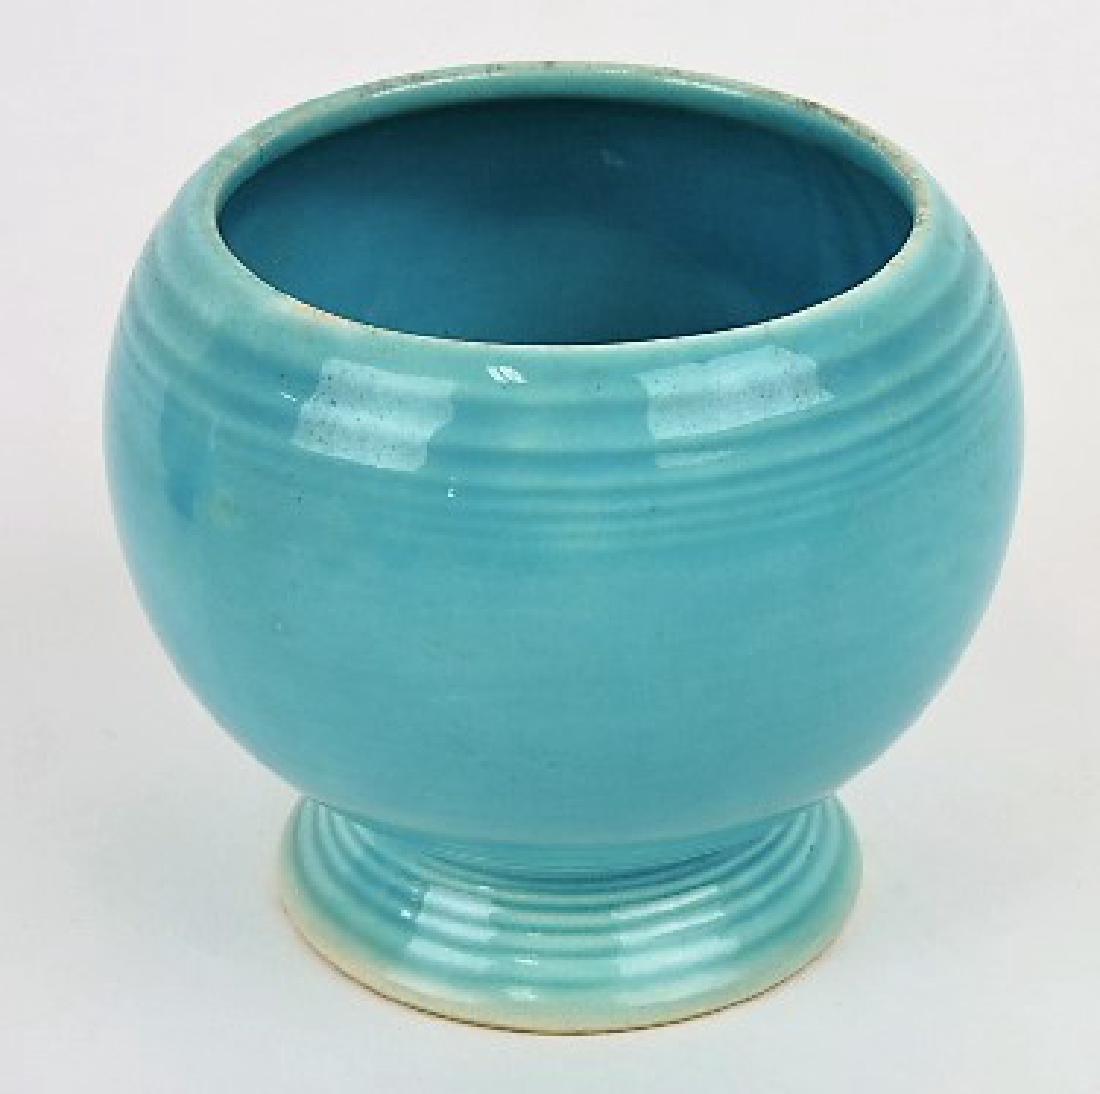 Fiesta marmalade base, turquoise